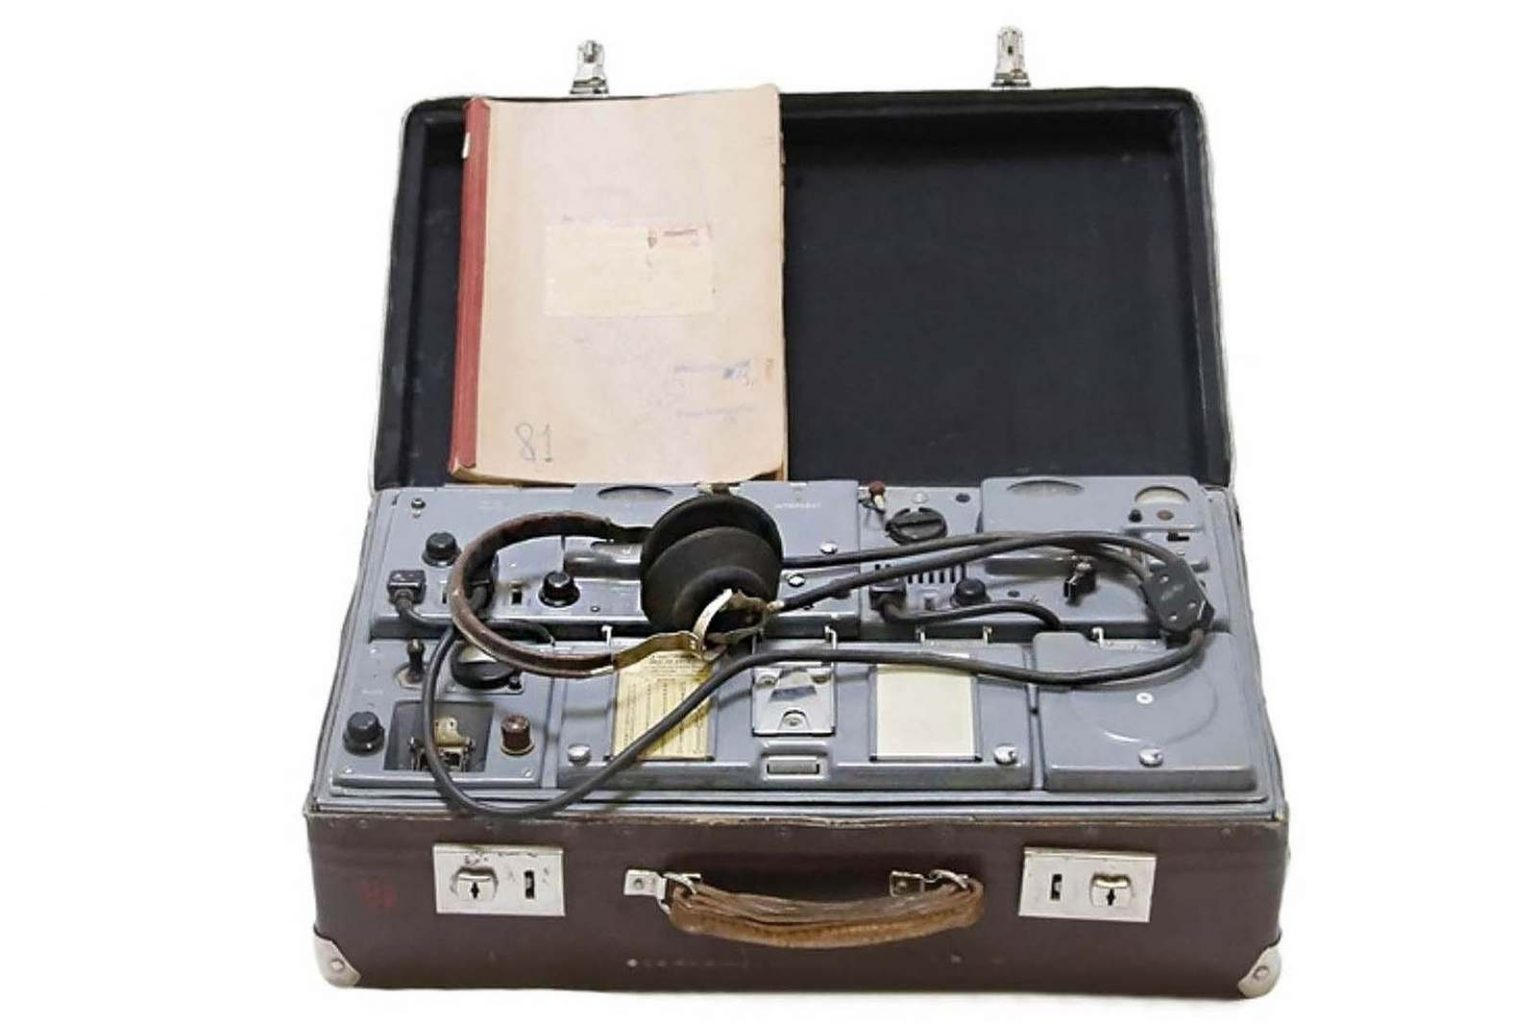 expo-kgb-valise-emeteur-radio